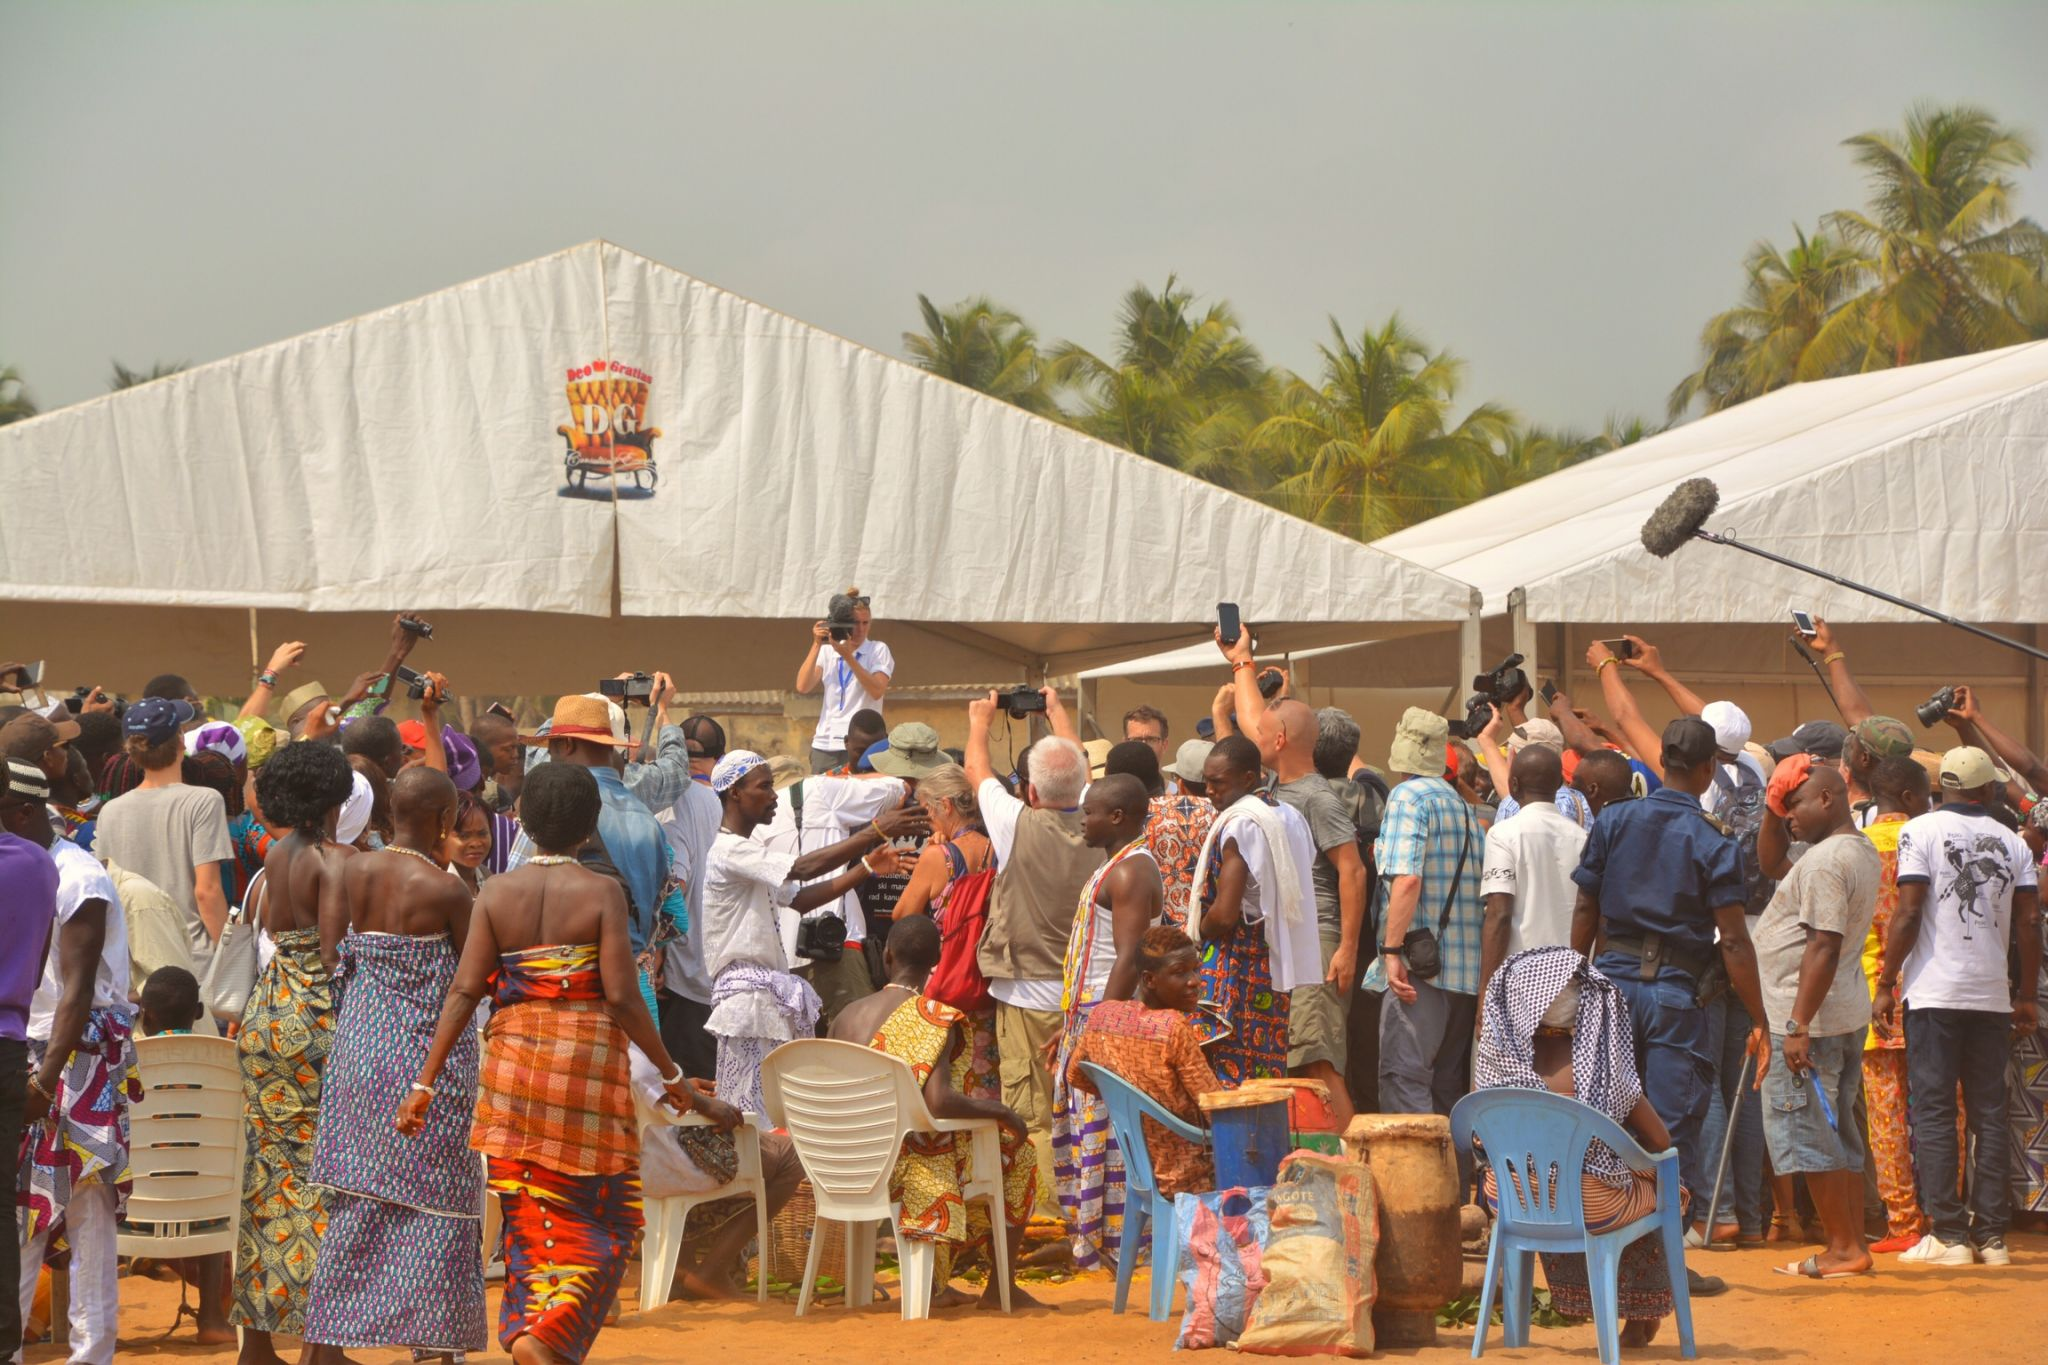 Spectators at the Voodoo Festival (Fete du Vodoun), Ouidah, Benin